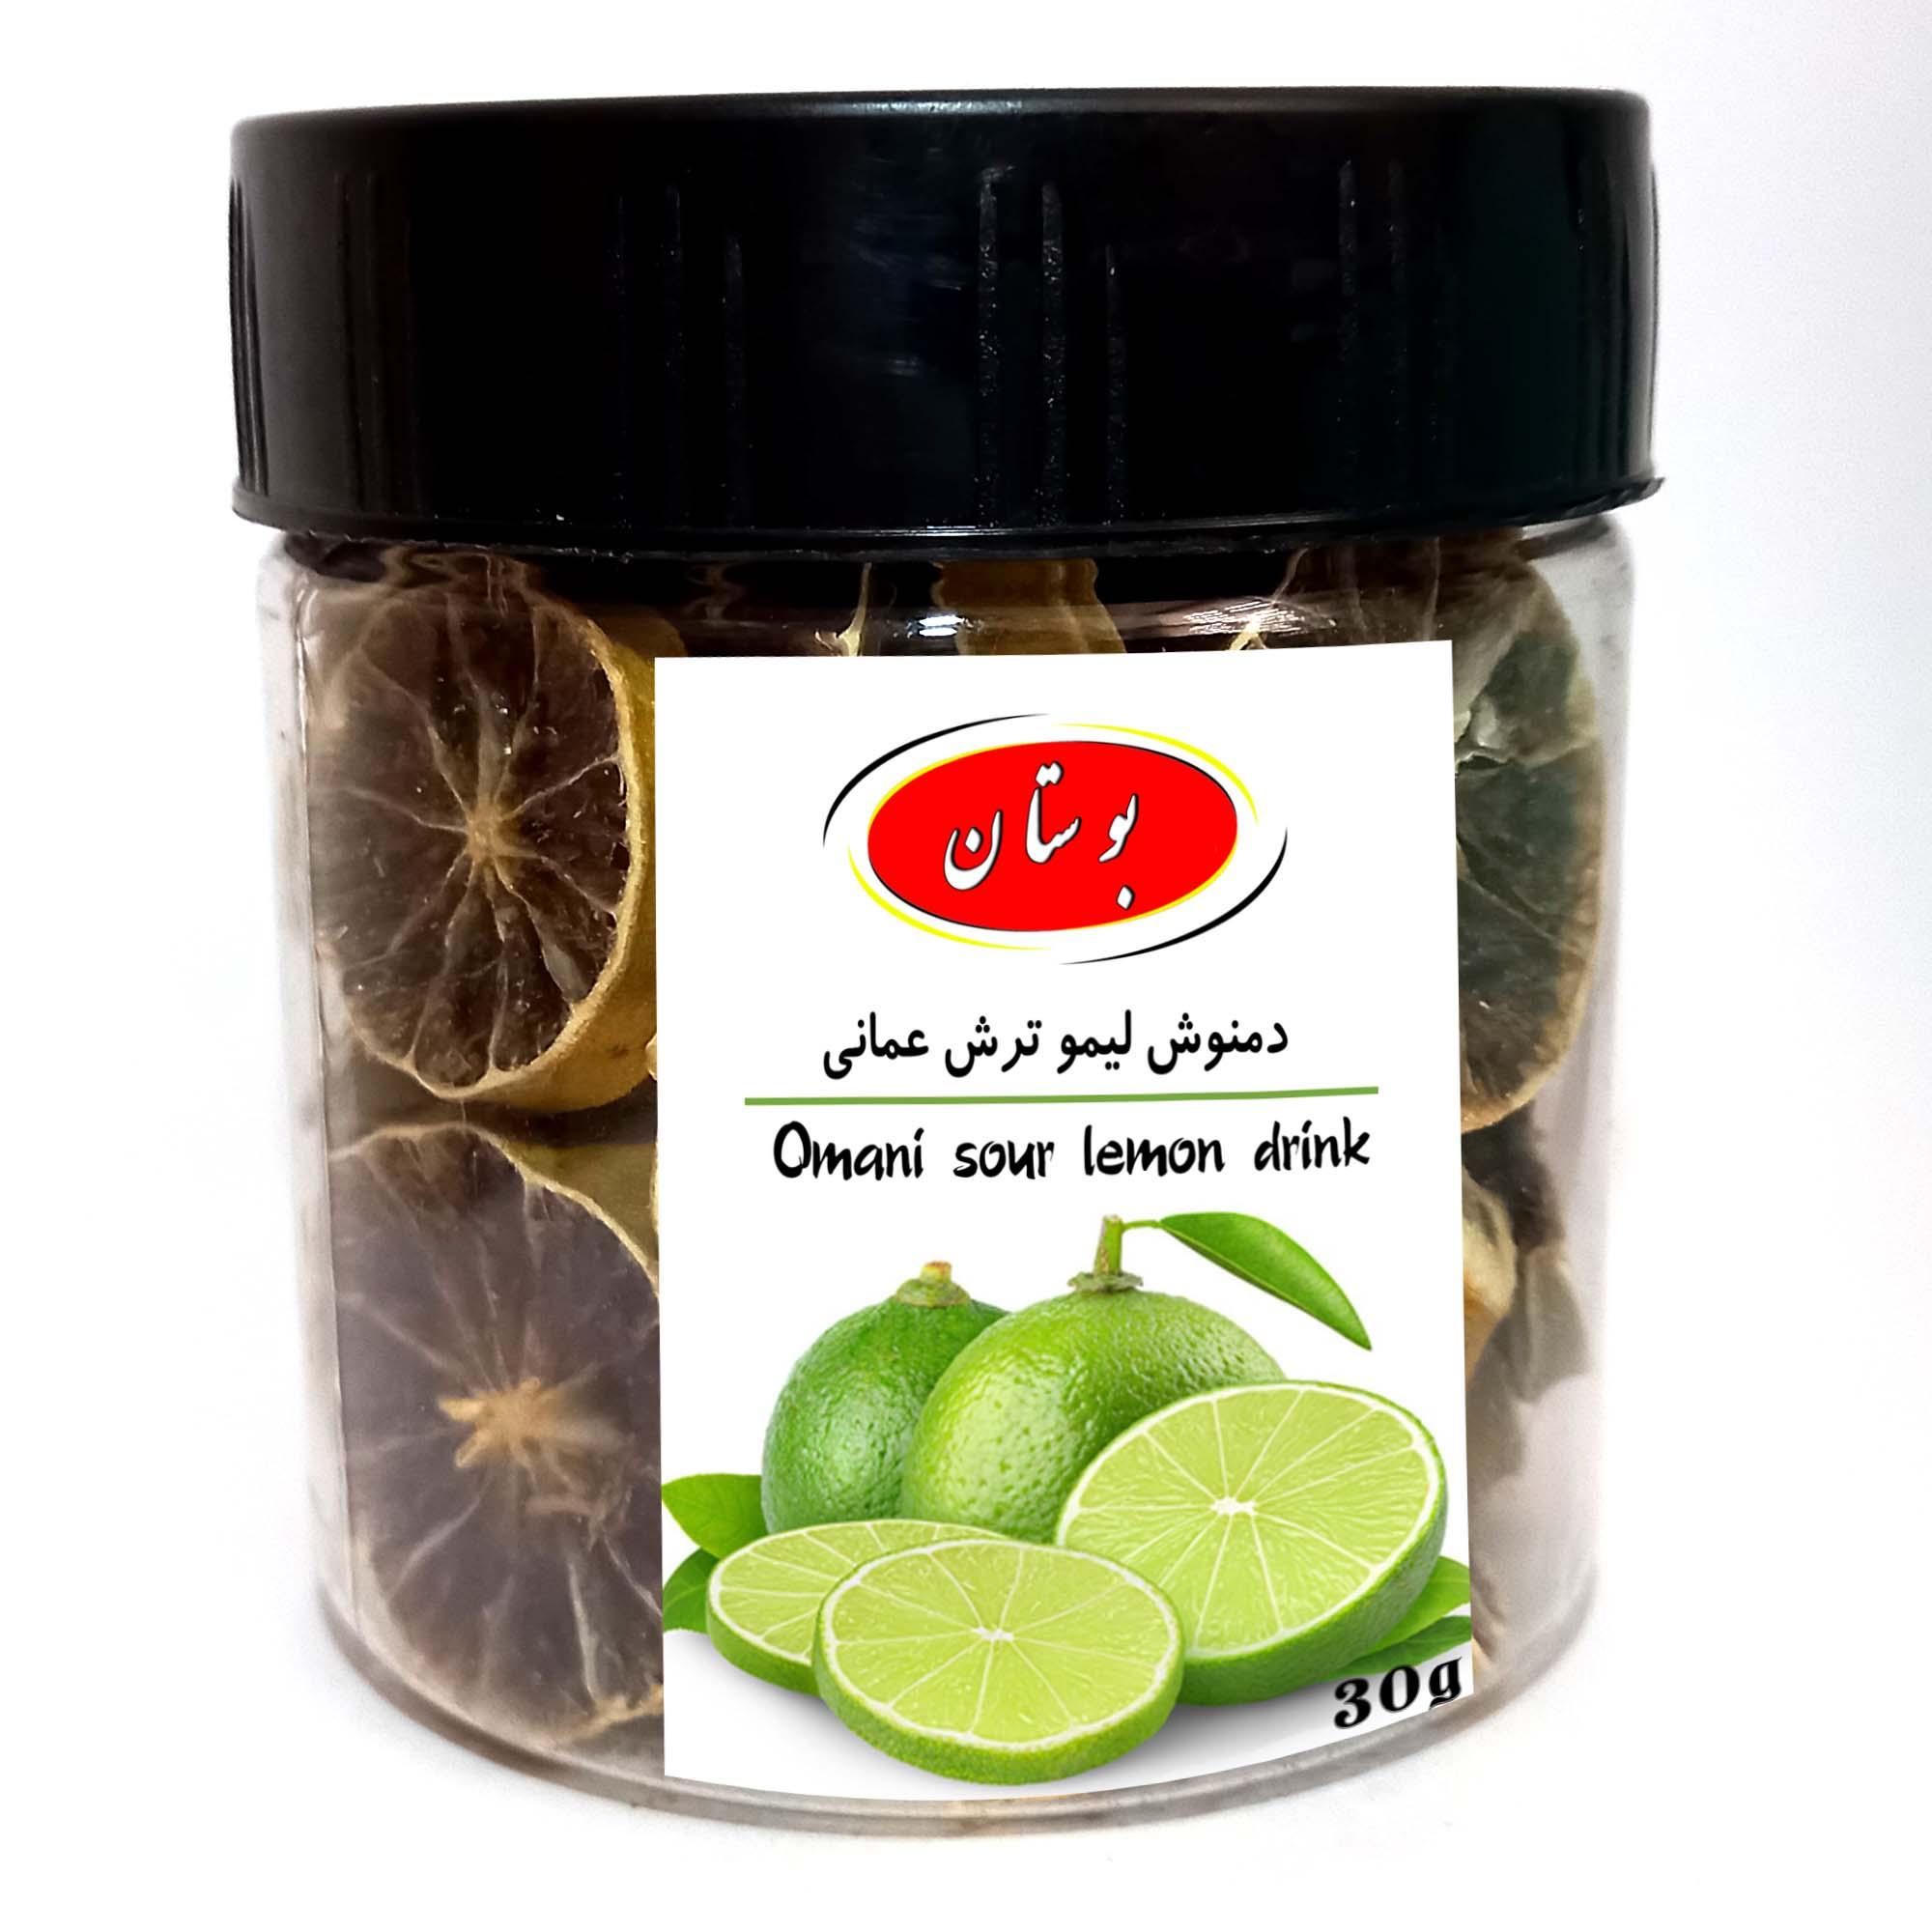 دمنوش لیمو ترش عمانی بوستان - 30 گرم